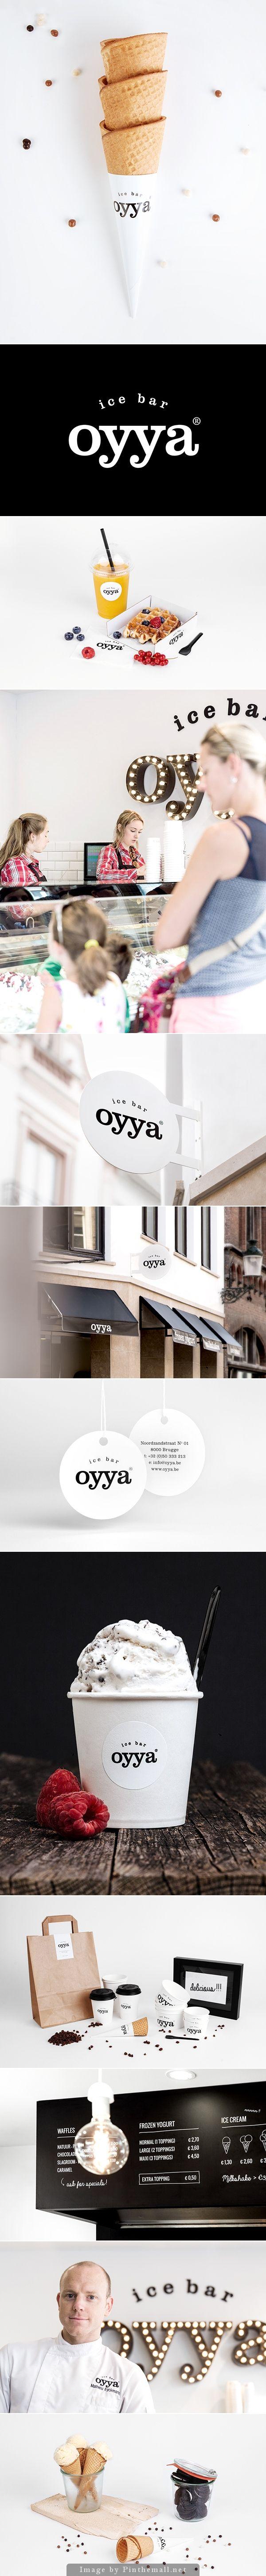 oyya - ice bar | by Skinn Branding Agency